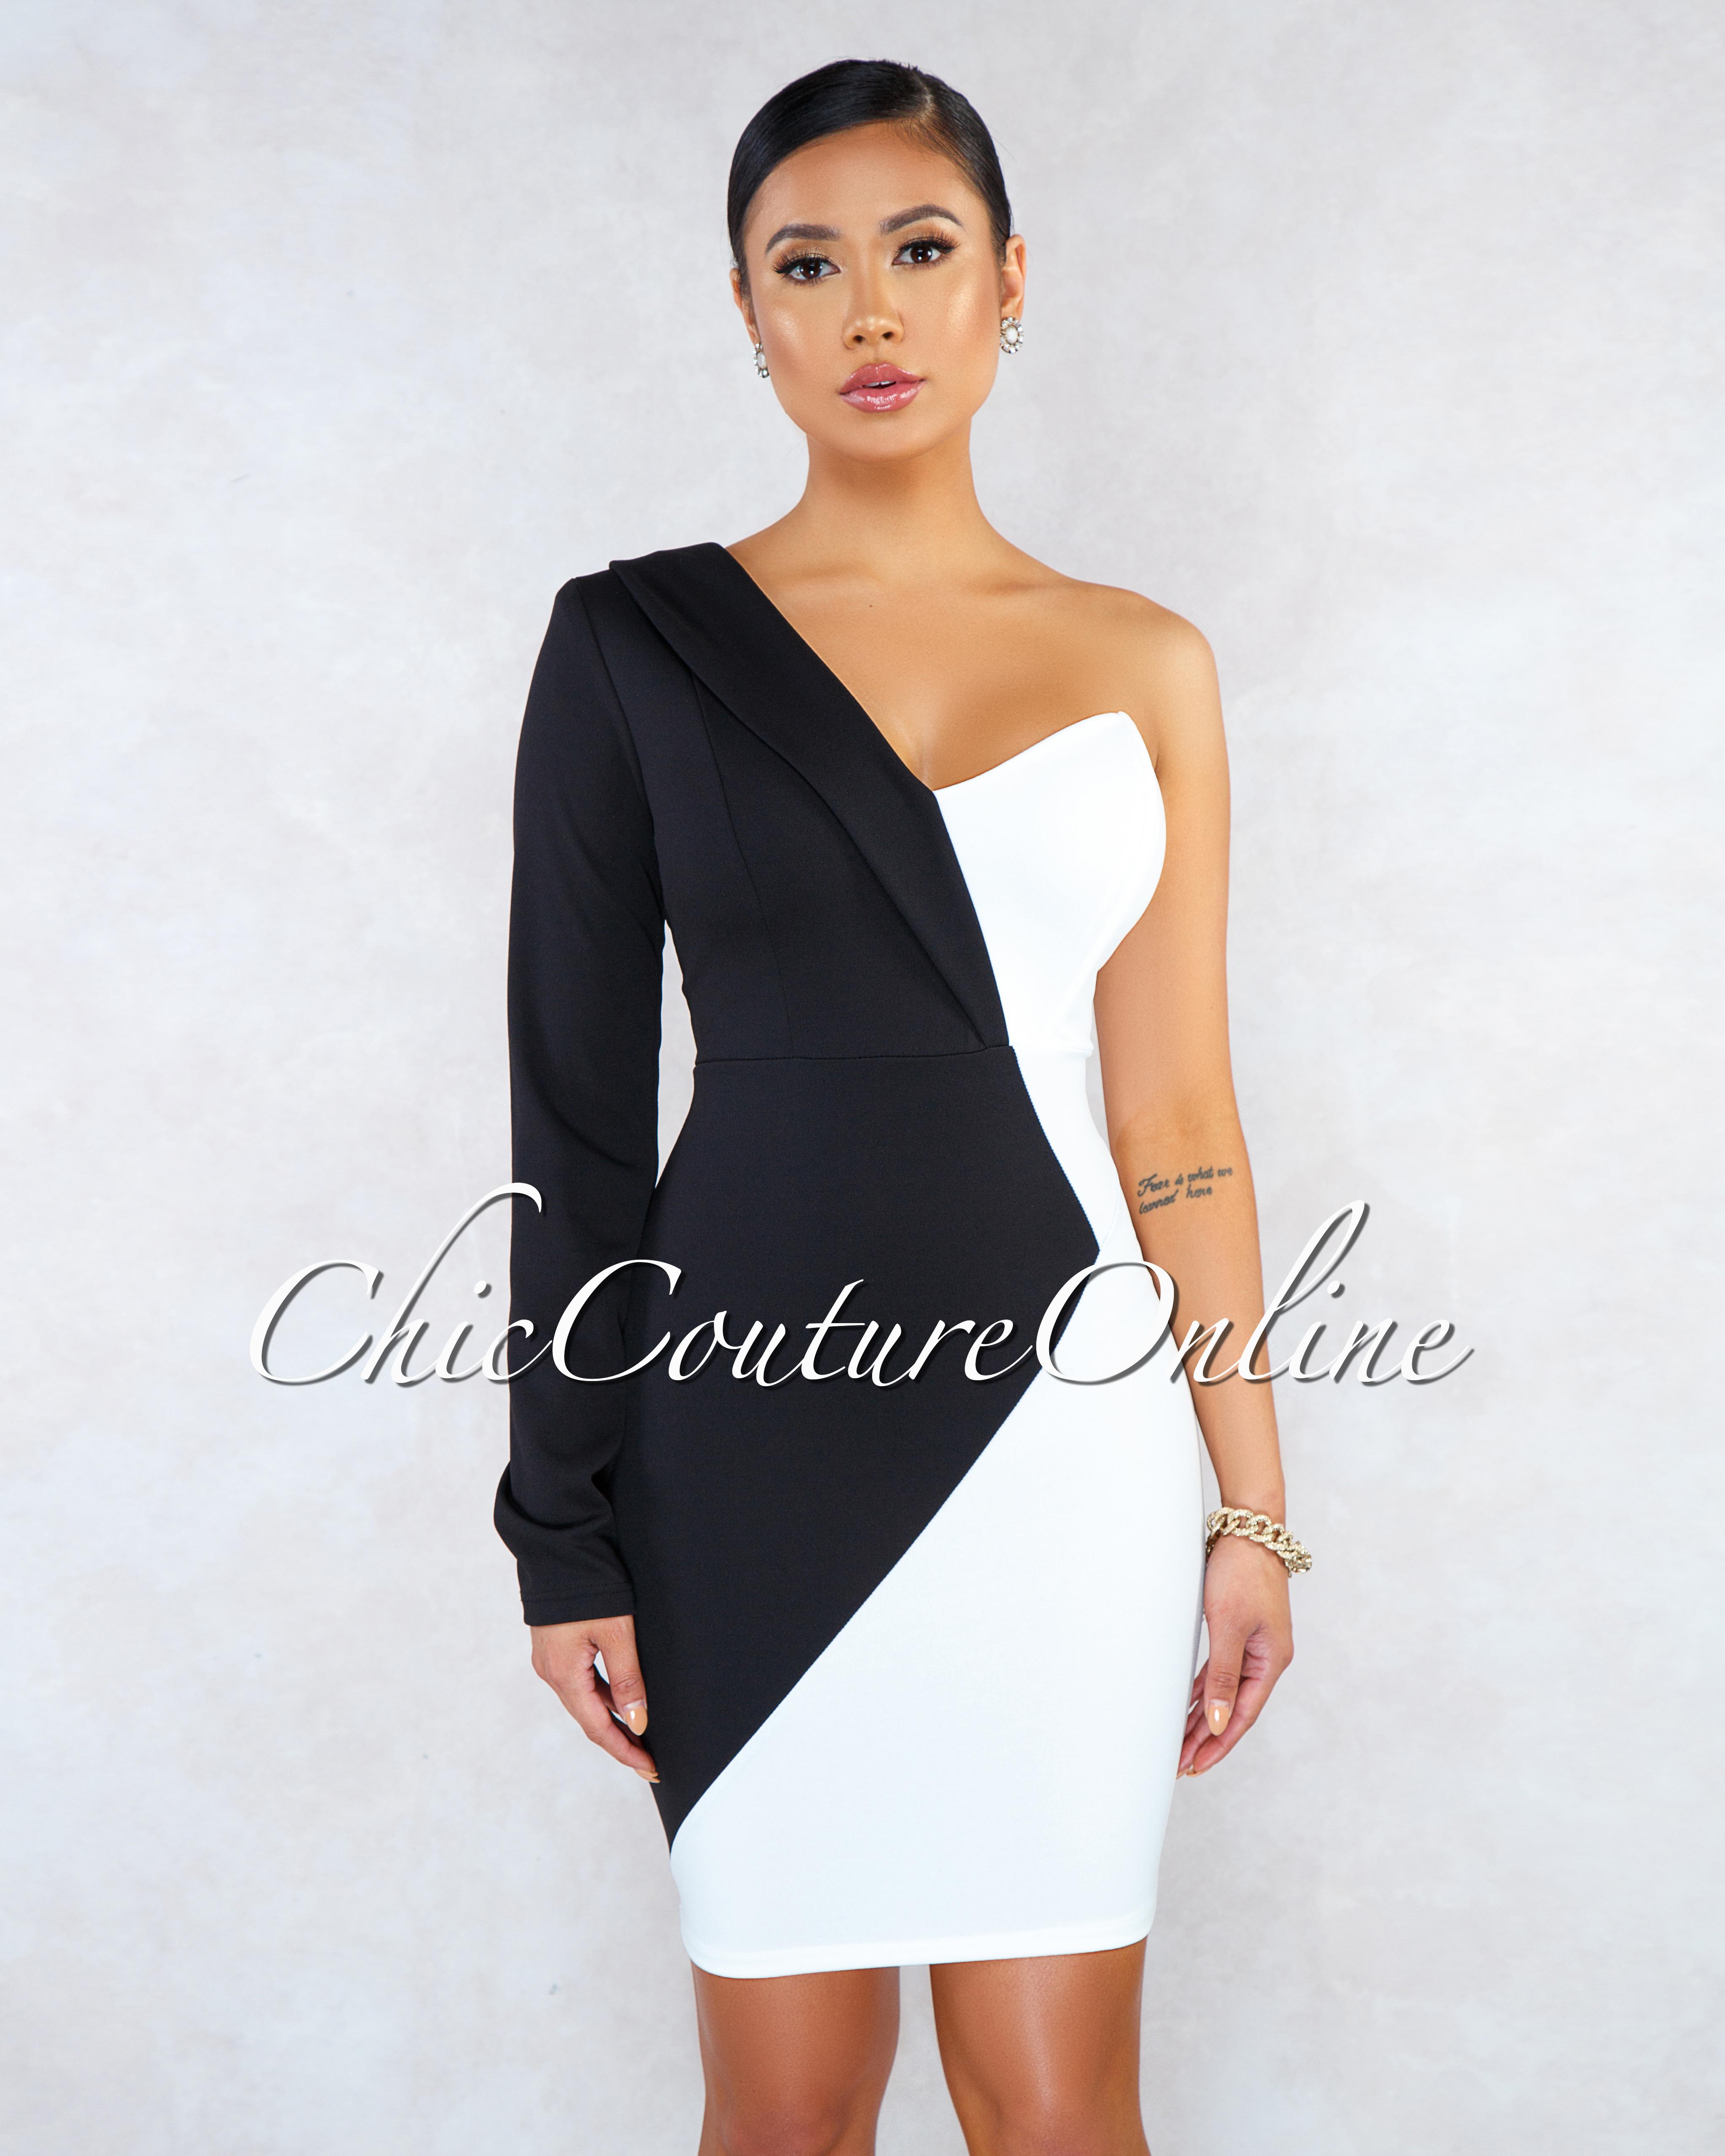 Ranthia Black White Two-Tone Single Long Sleeves Dress